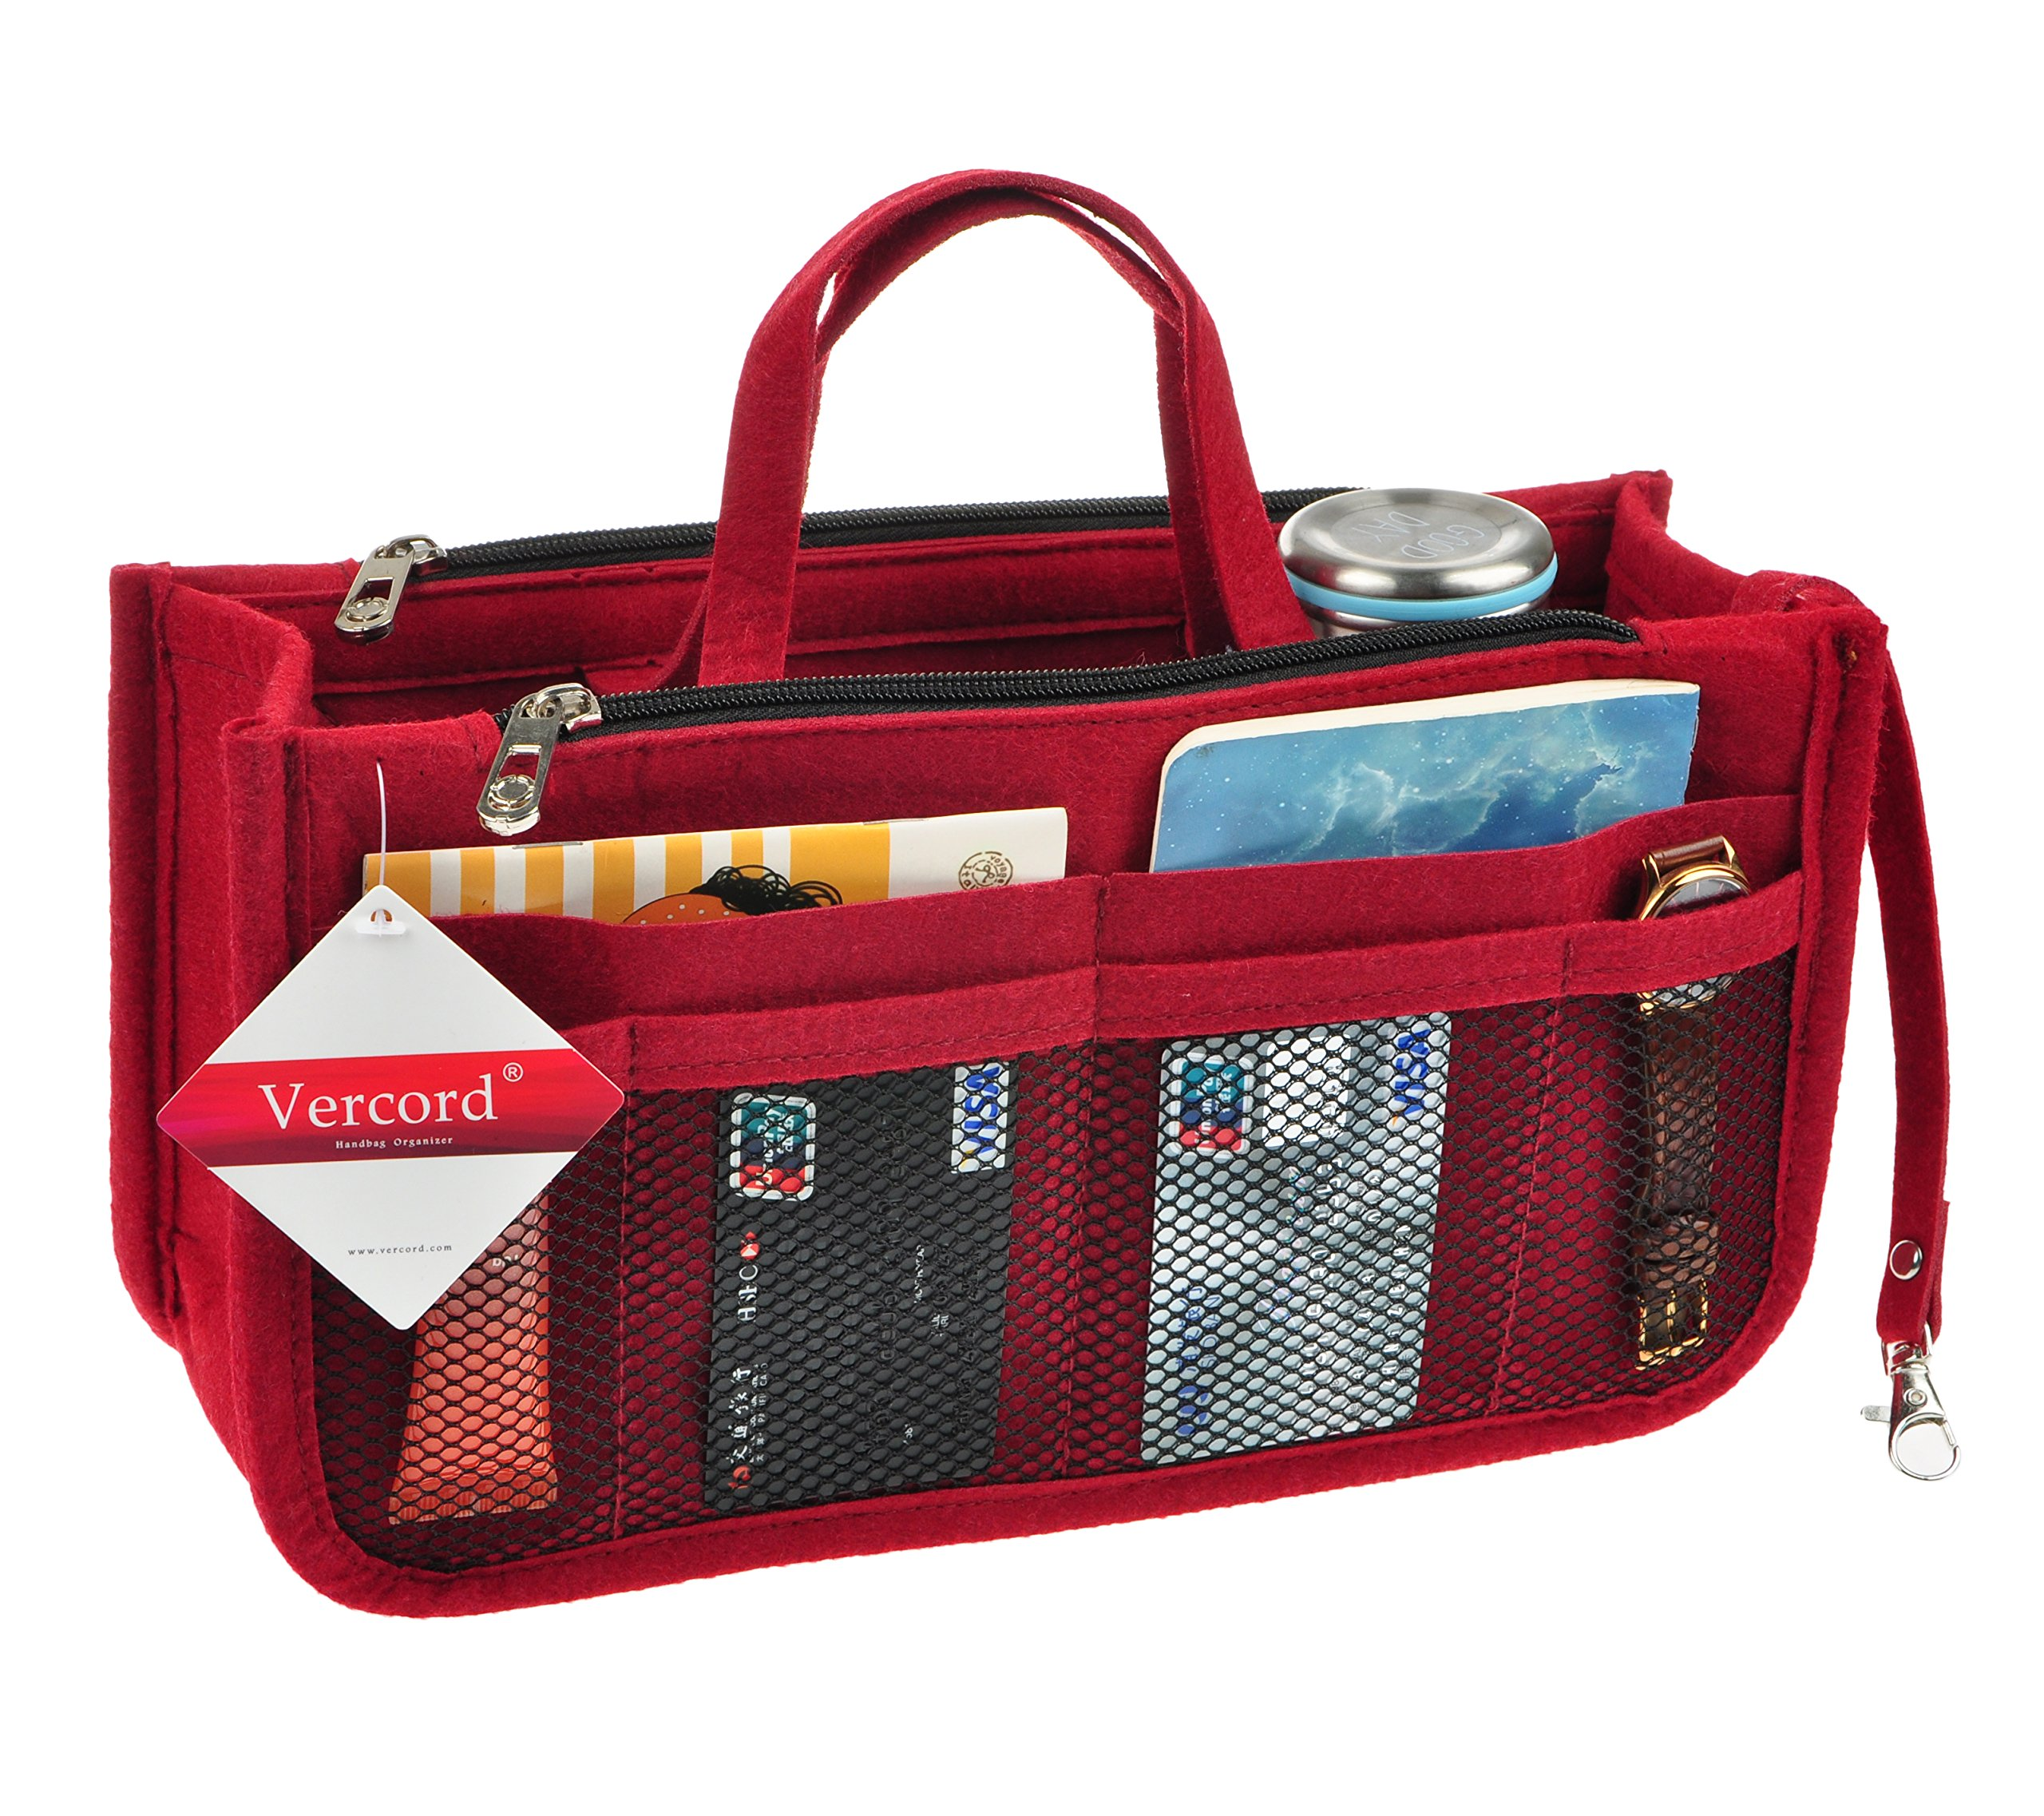 Vercord Sturdy Felt Handbag Purse Organizer Insert With Keychain 17 Compartments, Burgundy M